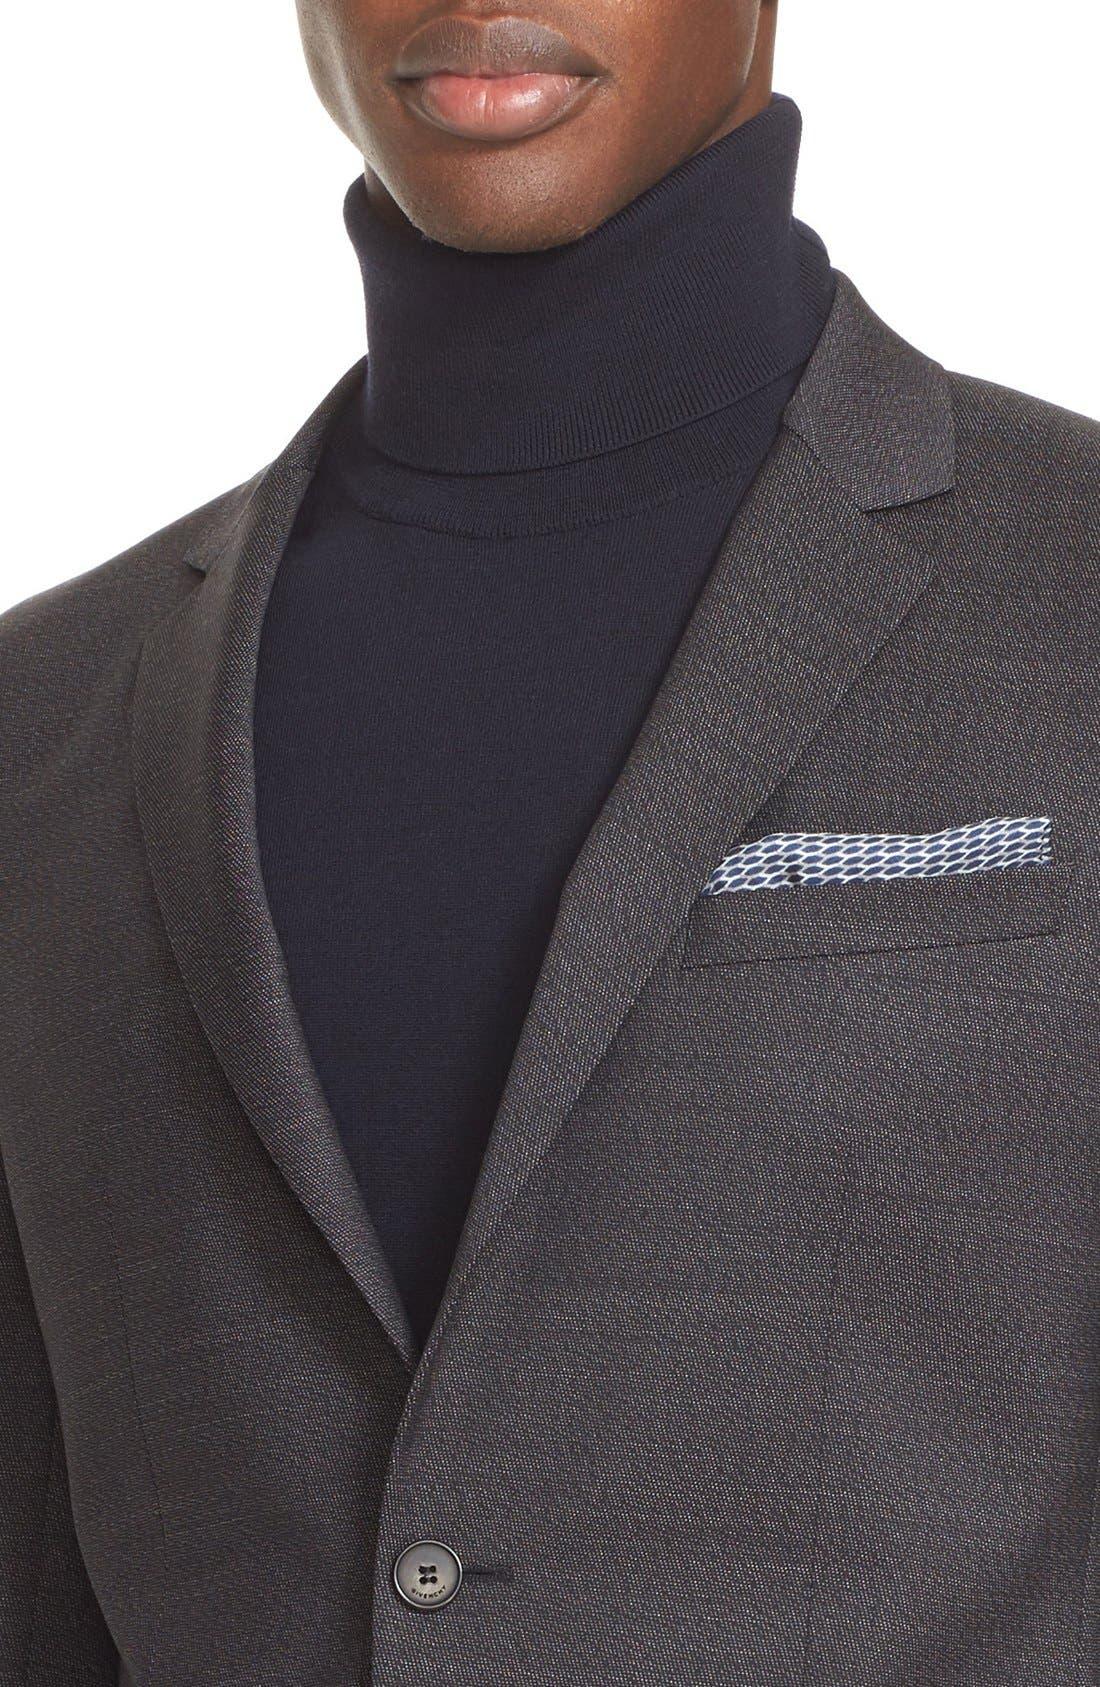 Extra Trim Fit Textured Wool Suit,                             Alternate thumbnail 4, color,                             Black